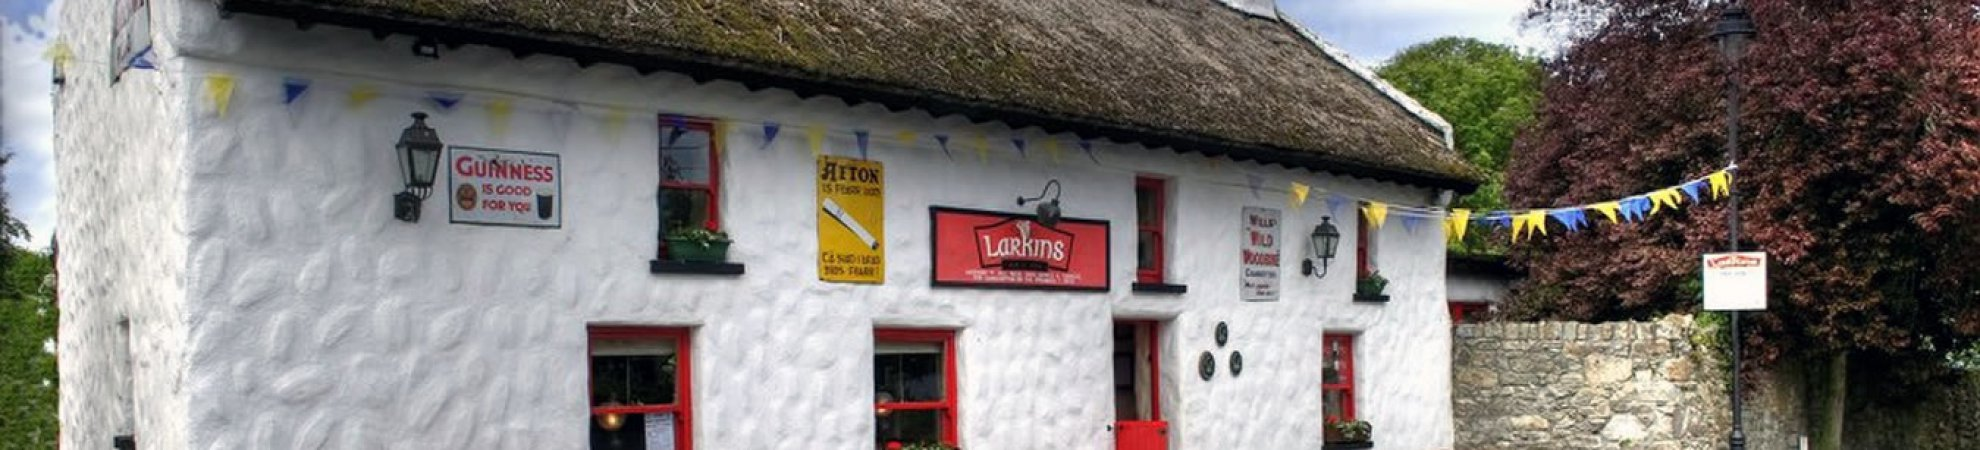 Larkins pub lough derg